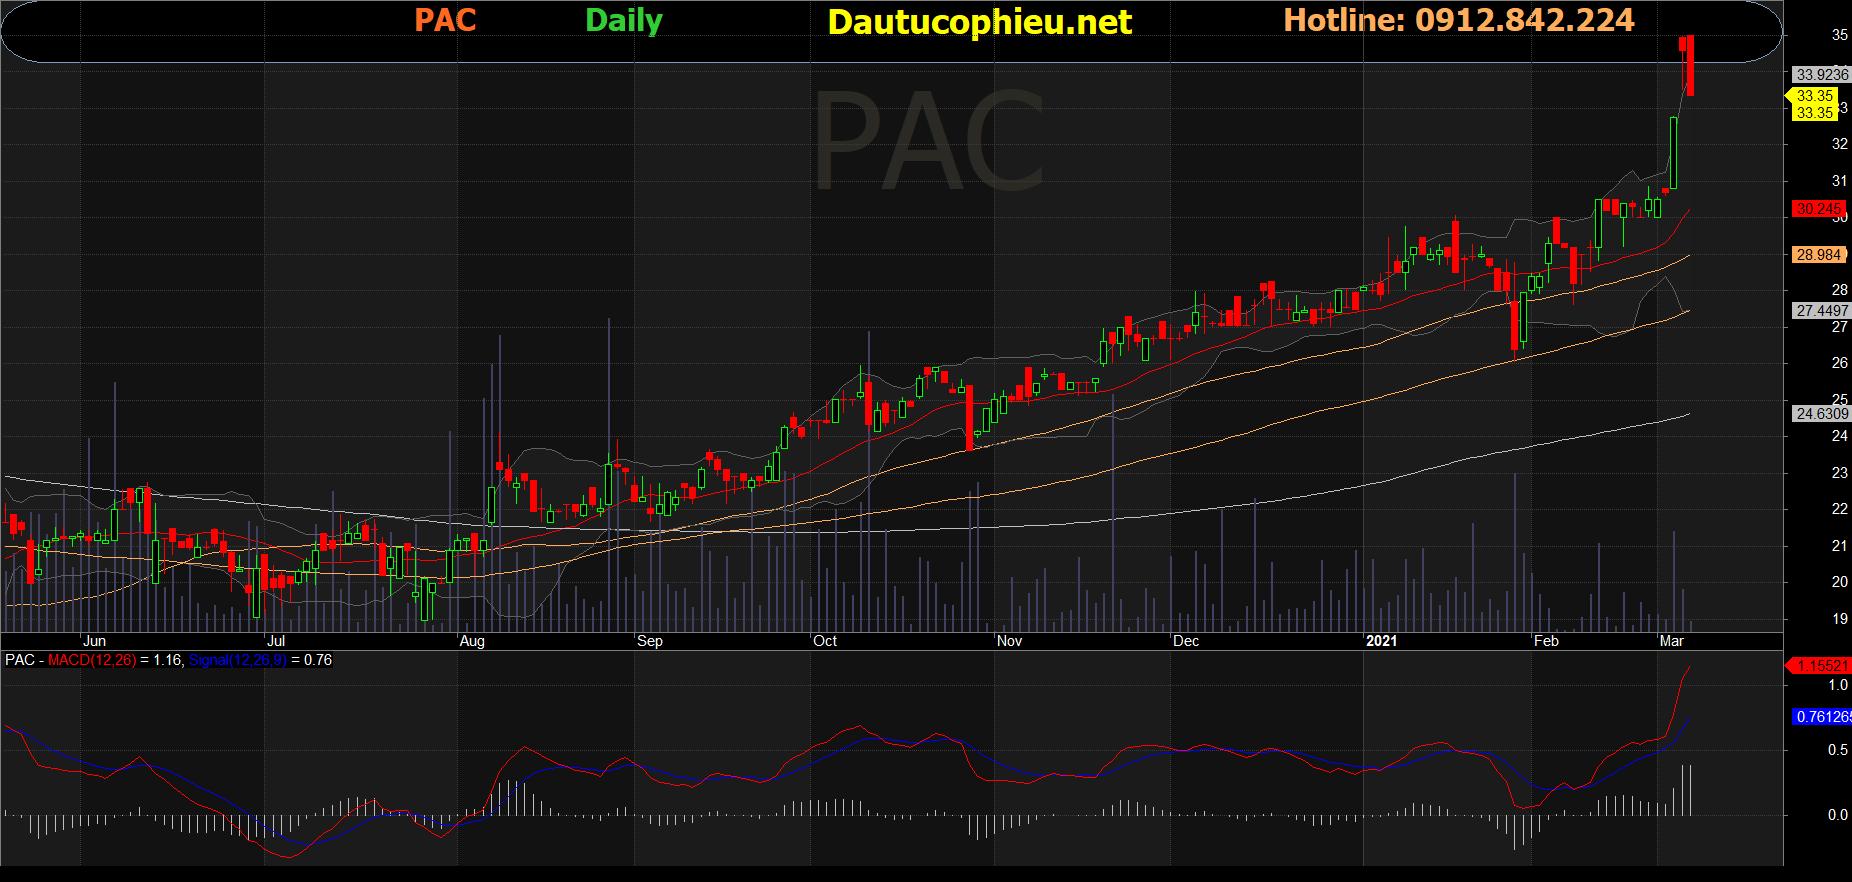 Cổ phiếu PAC